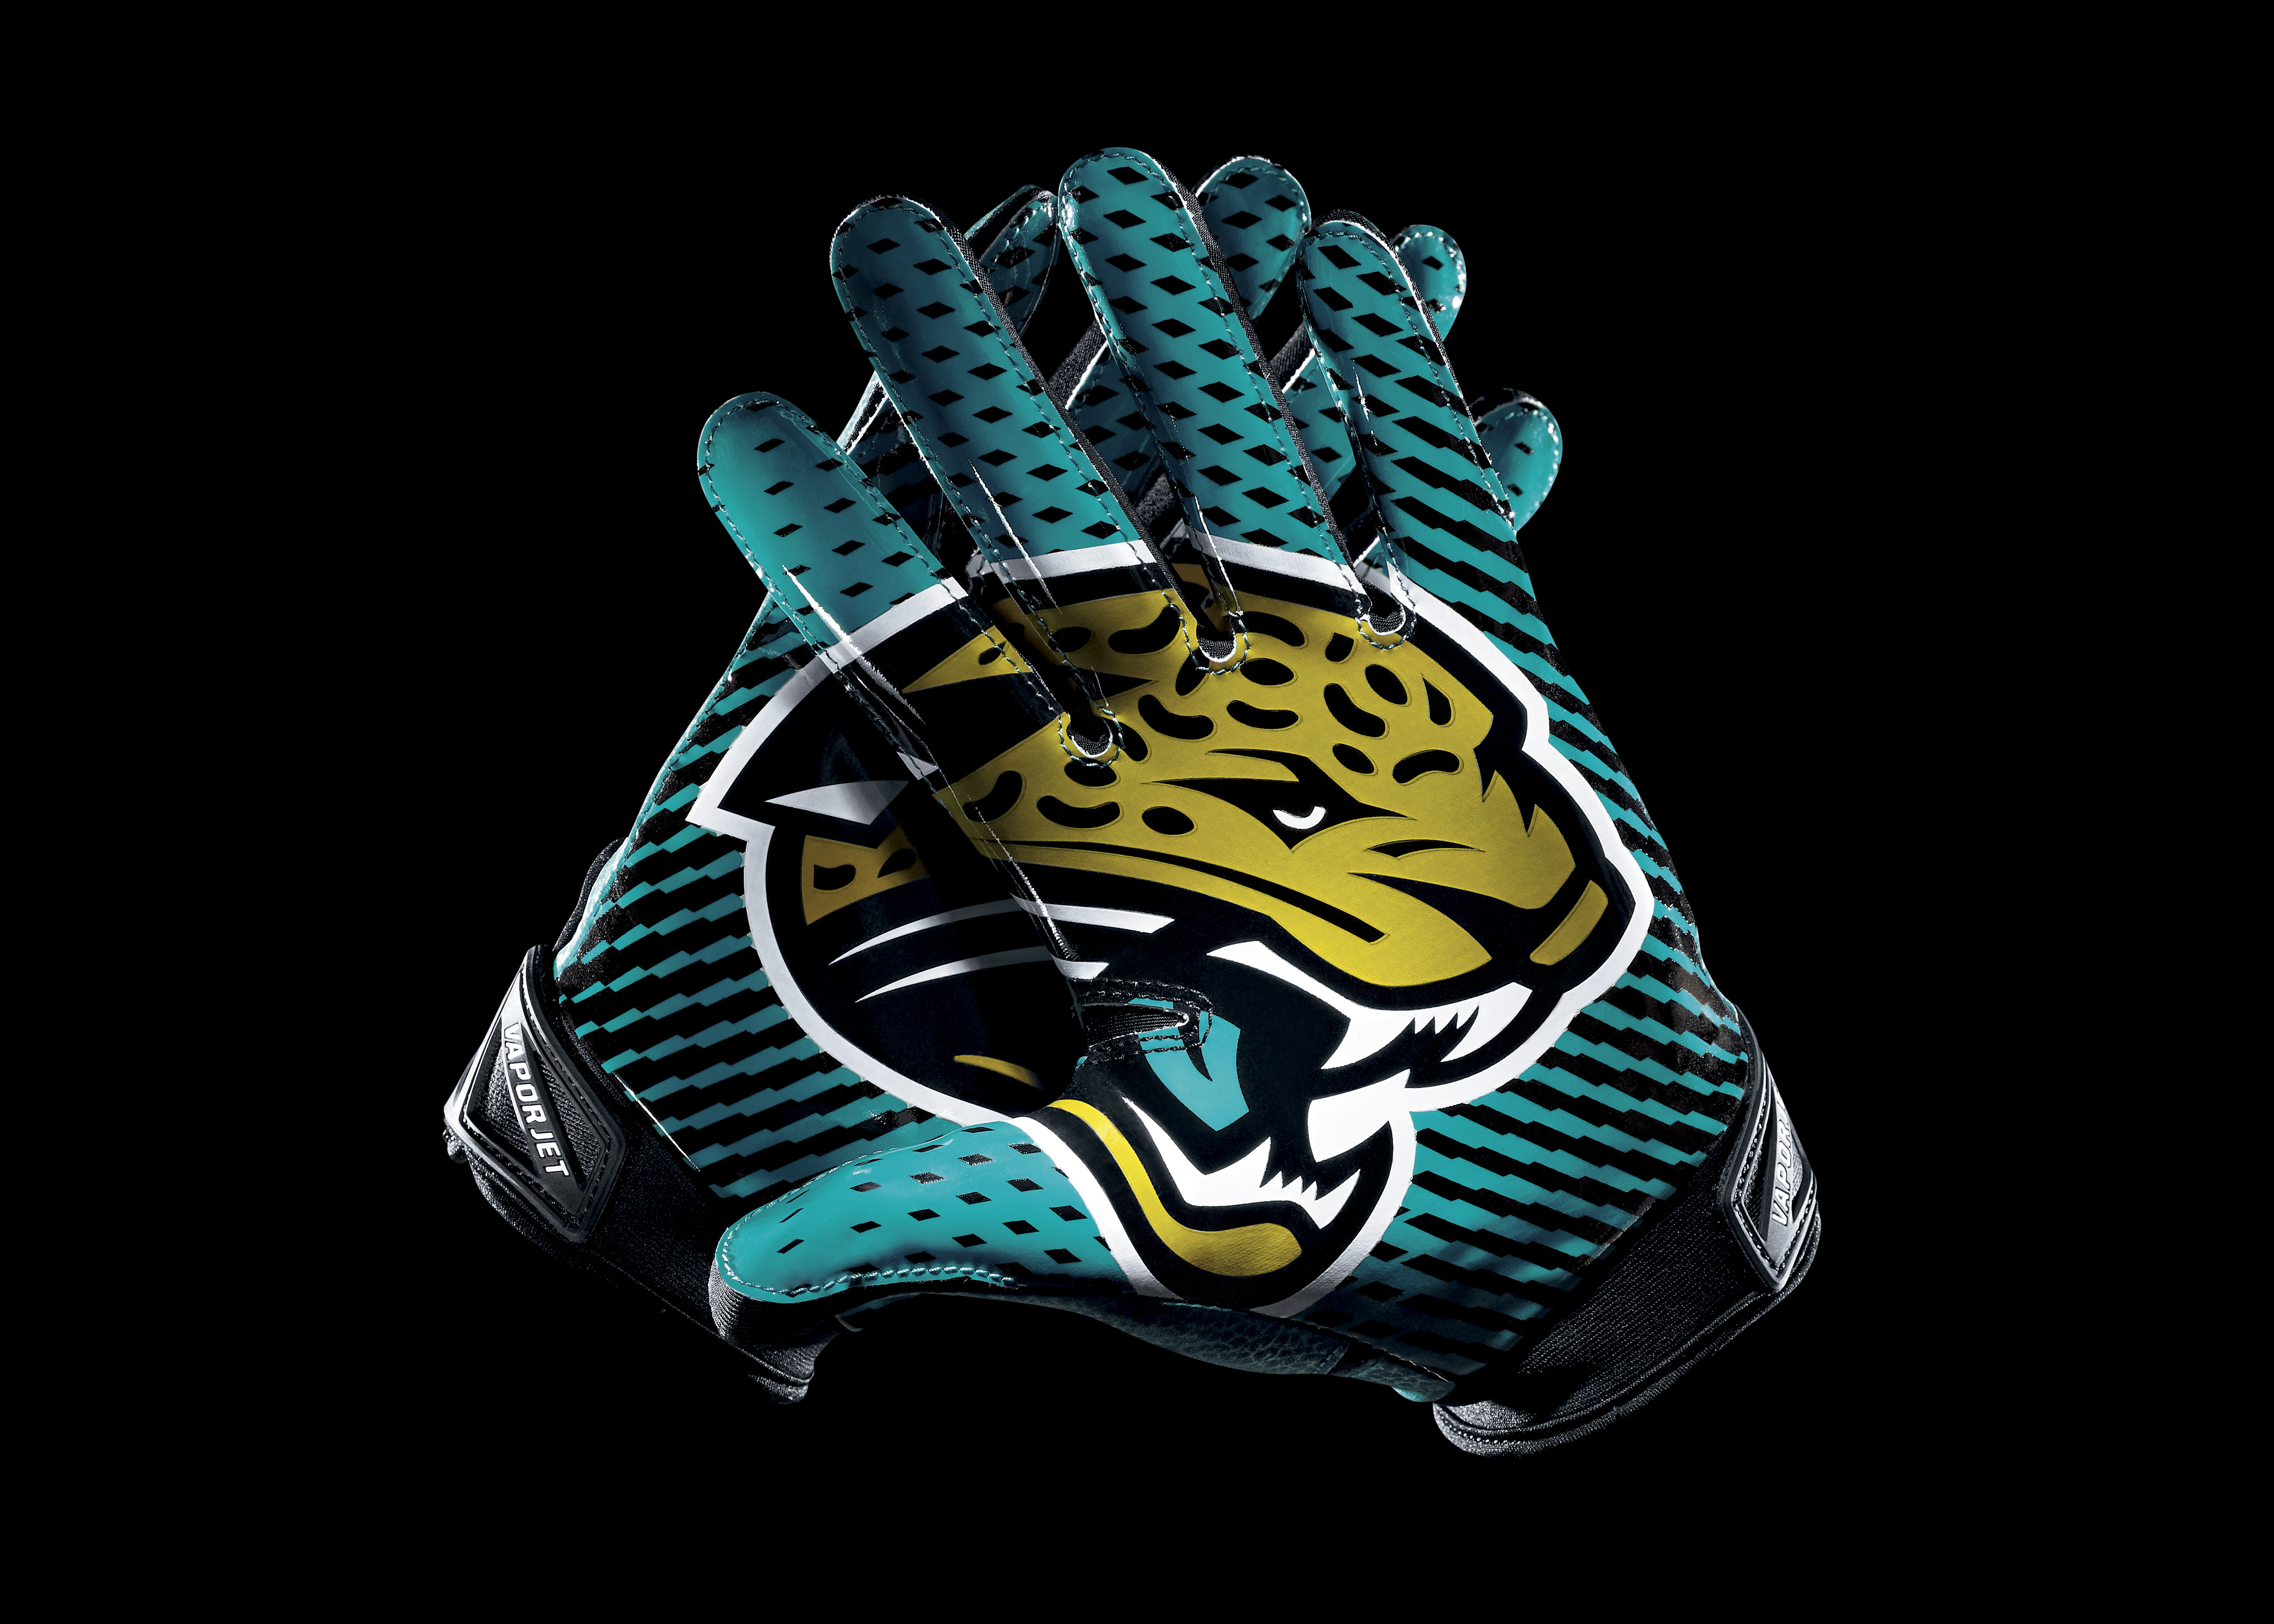 nike news jacksonville jaguars 2012 nike football uniform. Cars Review. Best American Auto & Cars Review